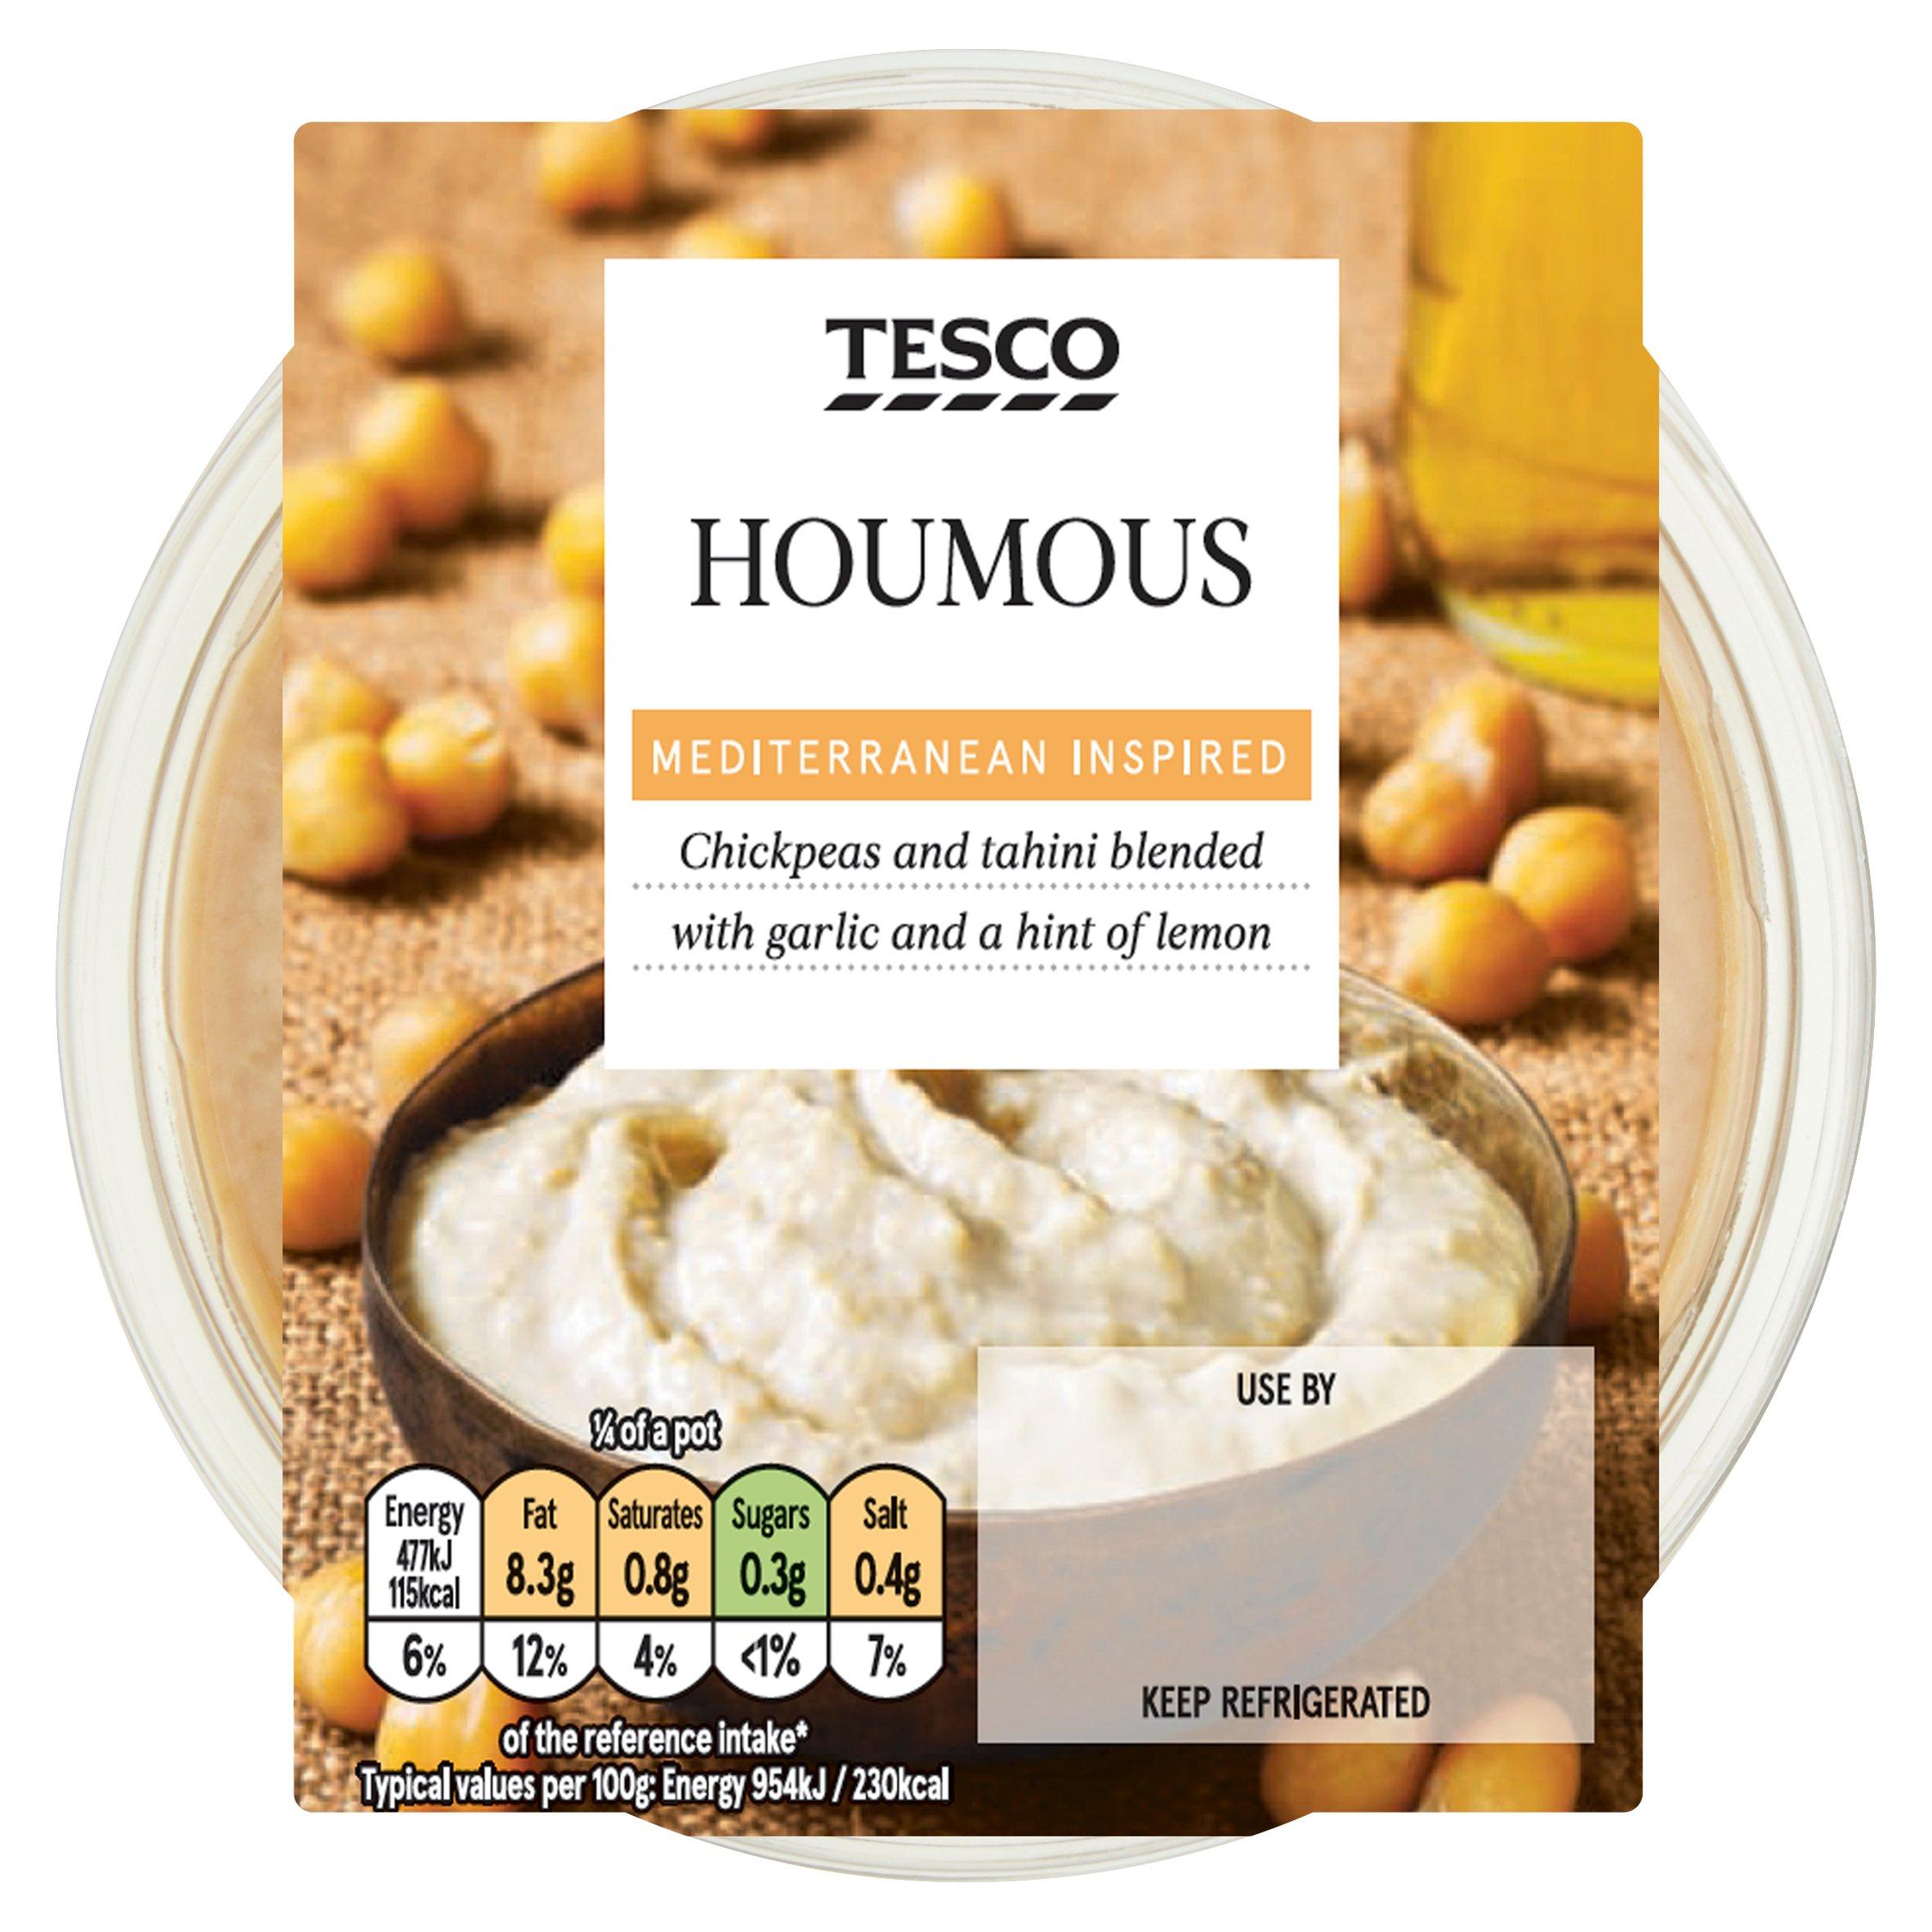 TESCO > Fresh Food > Tesco Houmous 200G